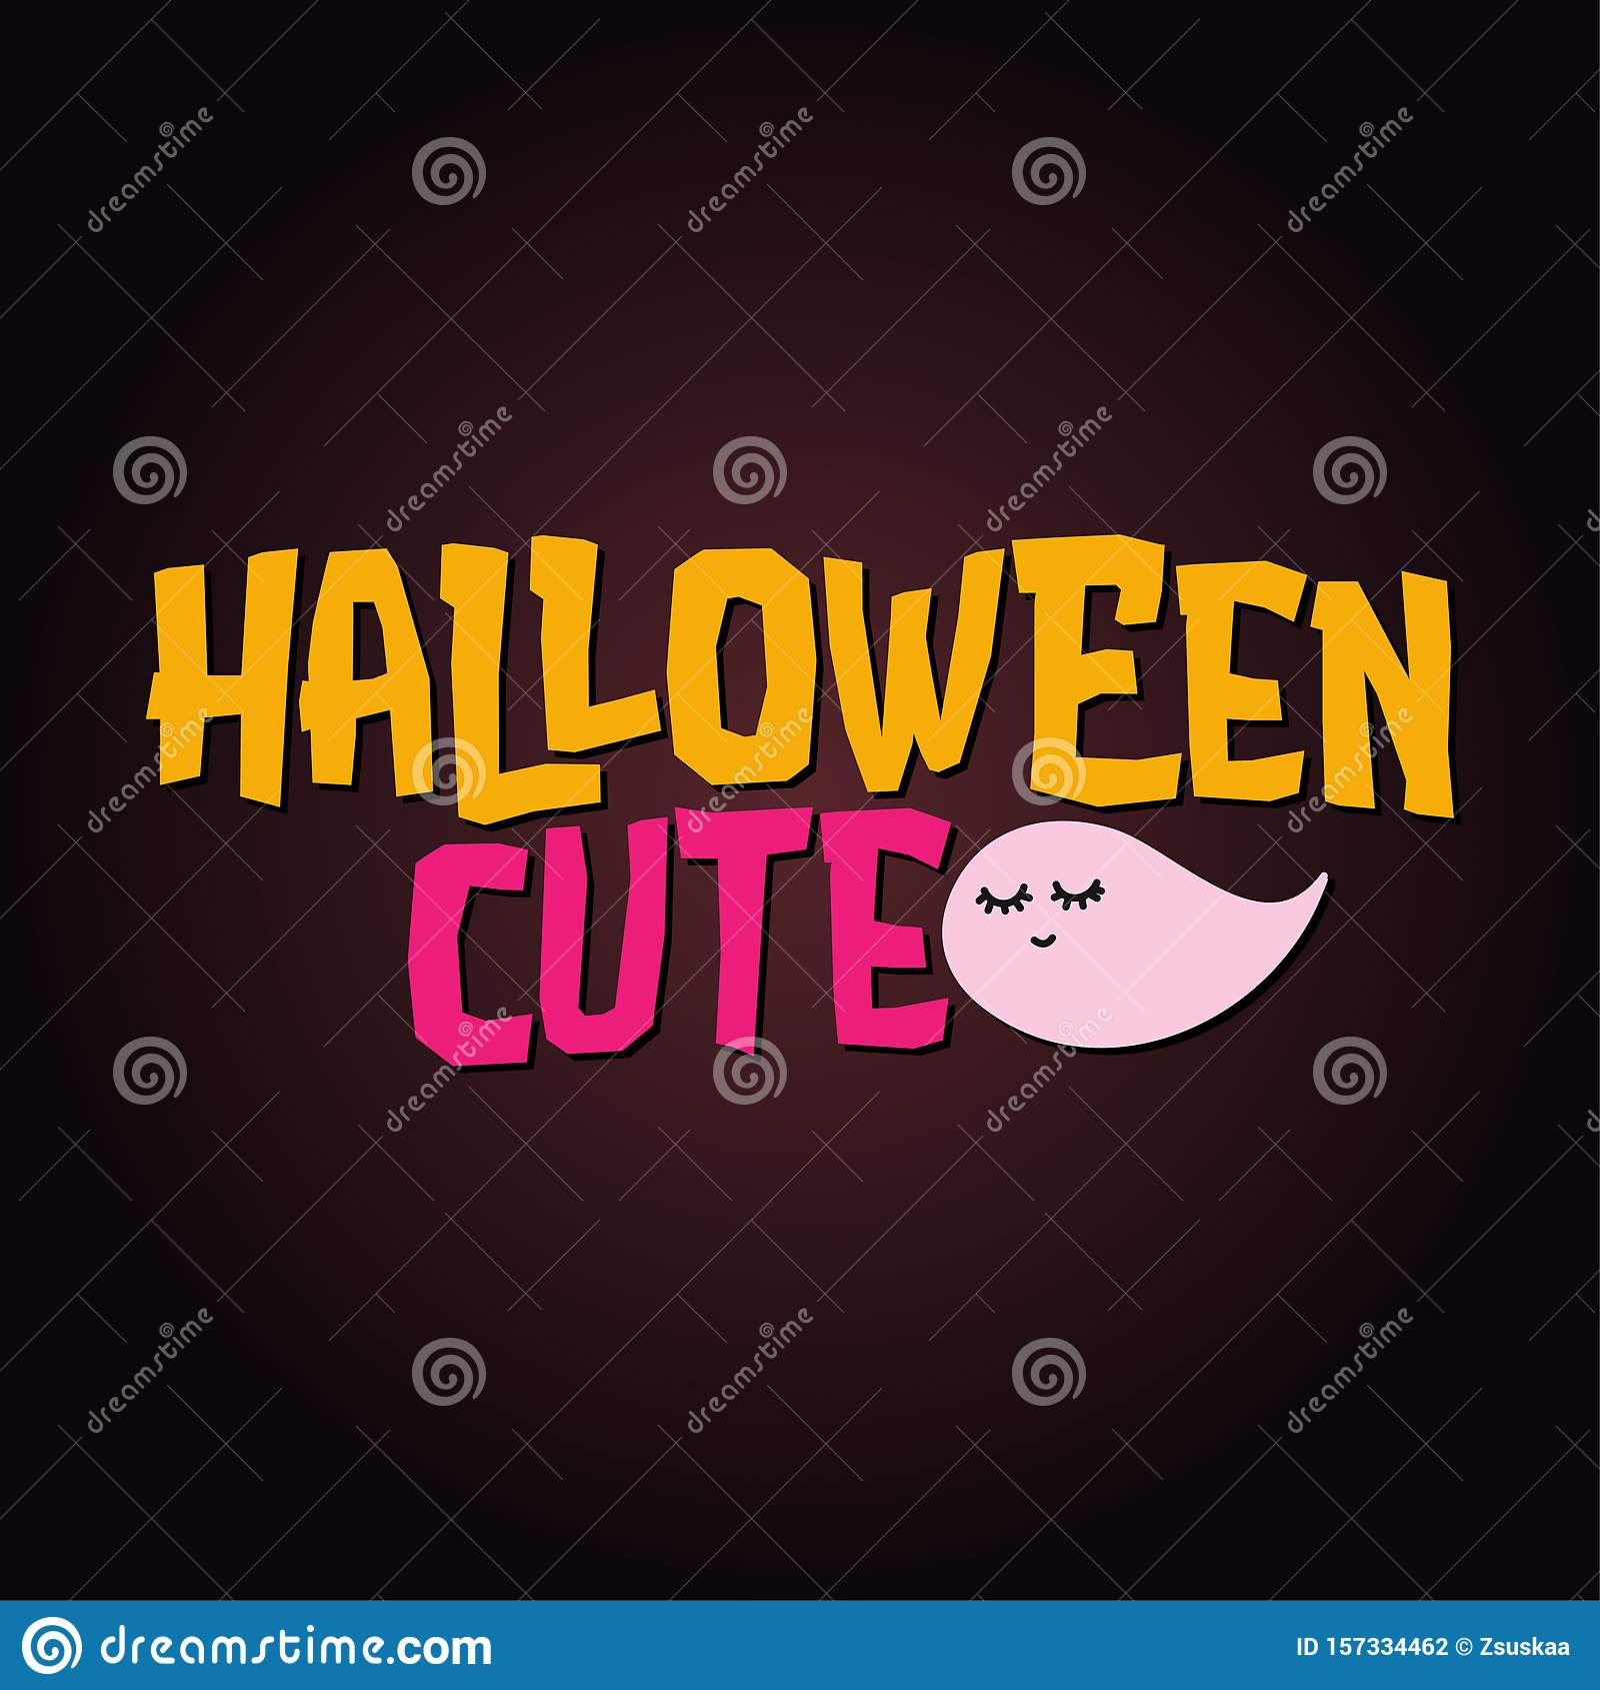 Halloween Cute - Halloween quote on black background.